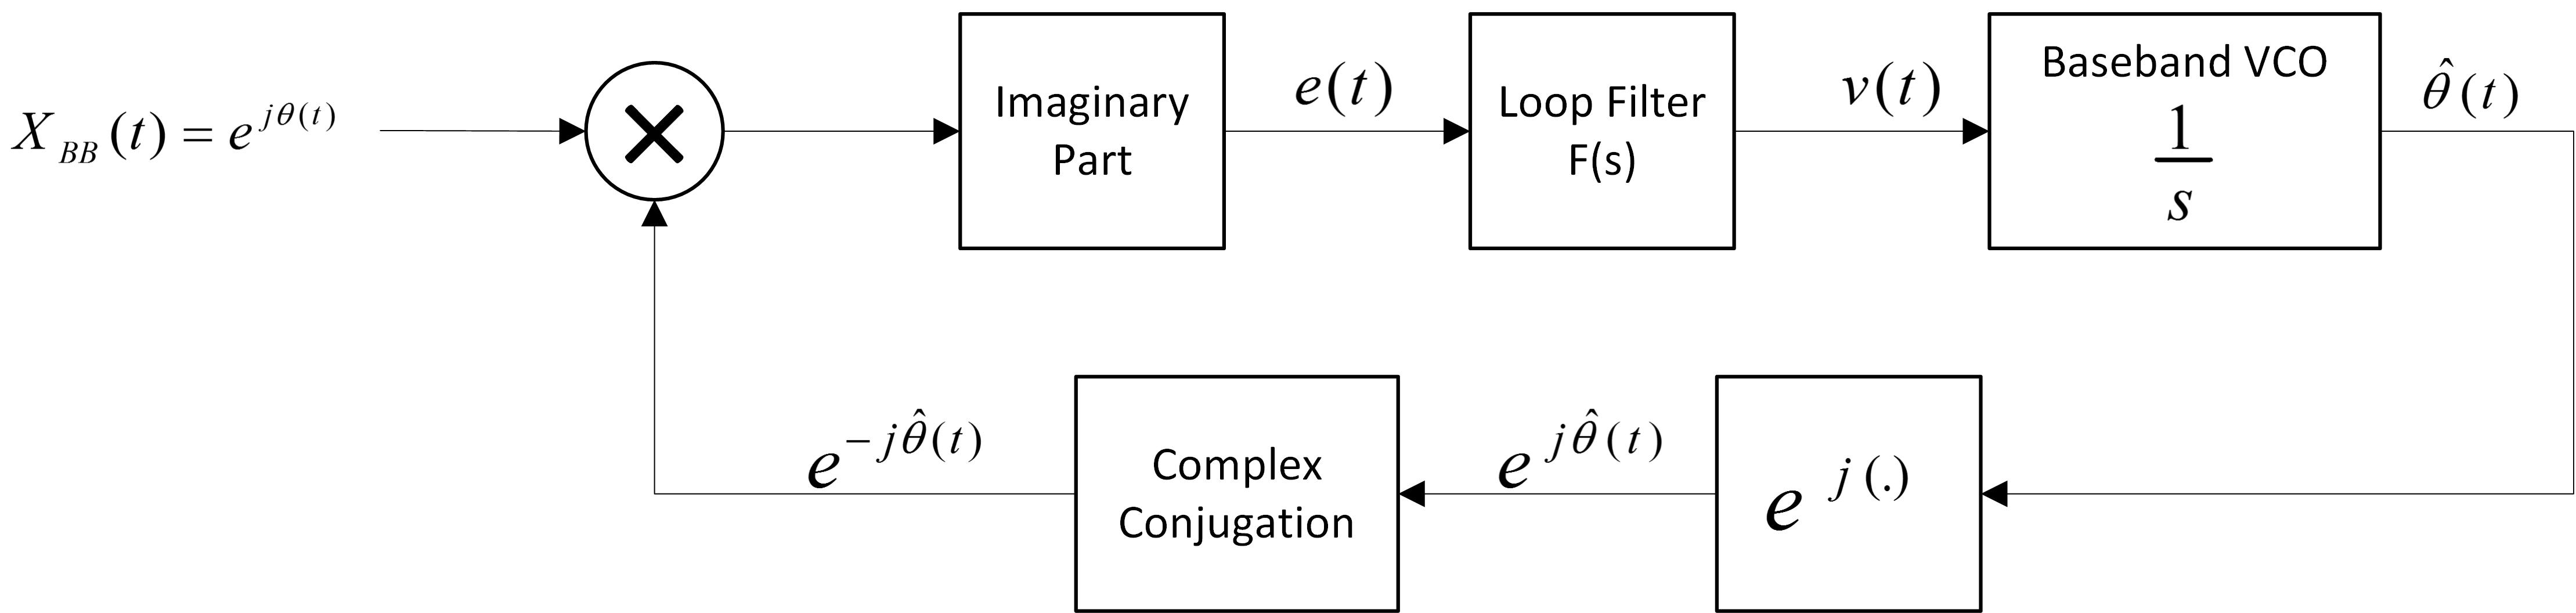 Discrete Time Plls Part 1 Basics Reza Ameli Sidebandsuppressed Carrier Rf Modulator Fm Modulation Block Diagram Based On What We Said The Overall Of A Pll Looks Like